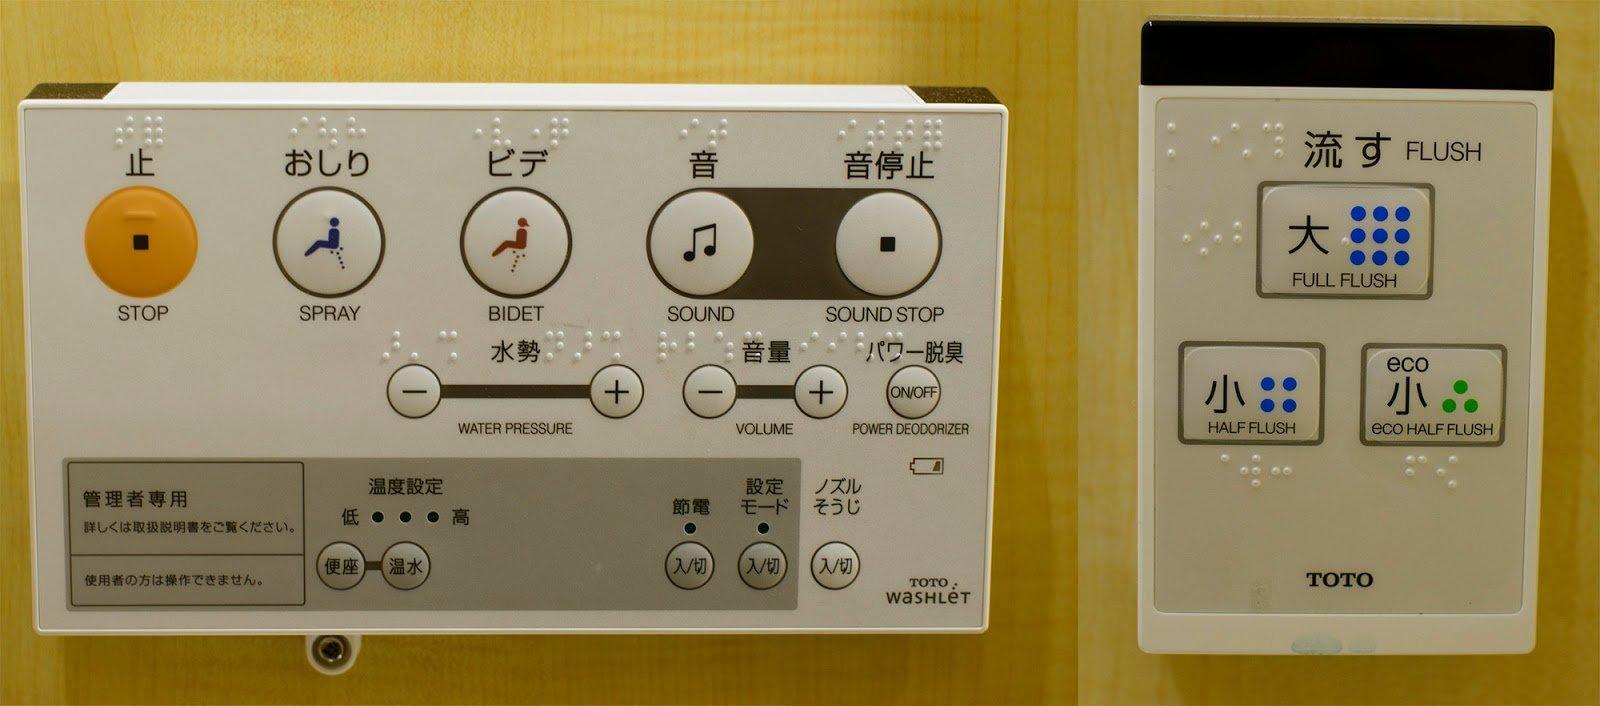 baños-japon